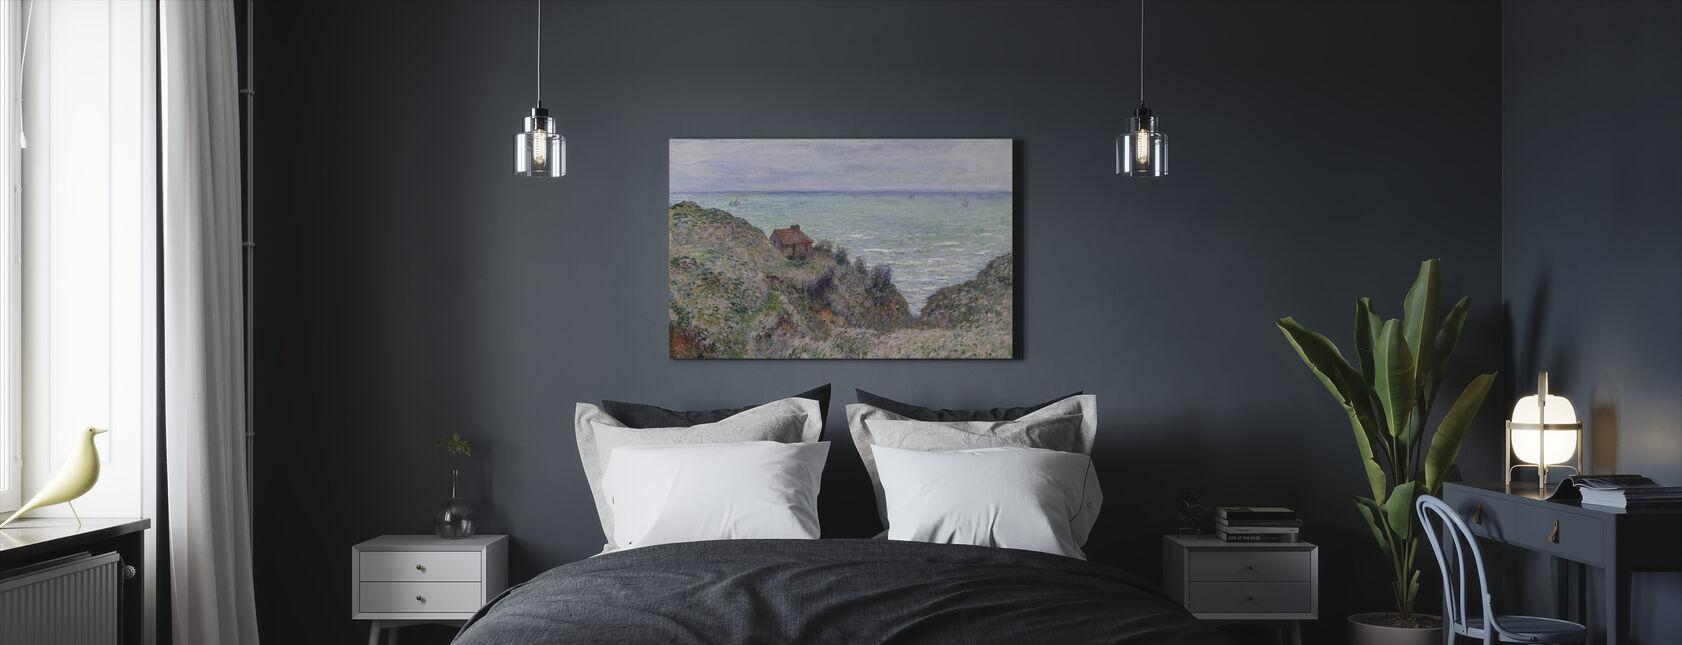 Hütte - Claude Monet - Leinwandbild - Schlafzimmer